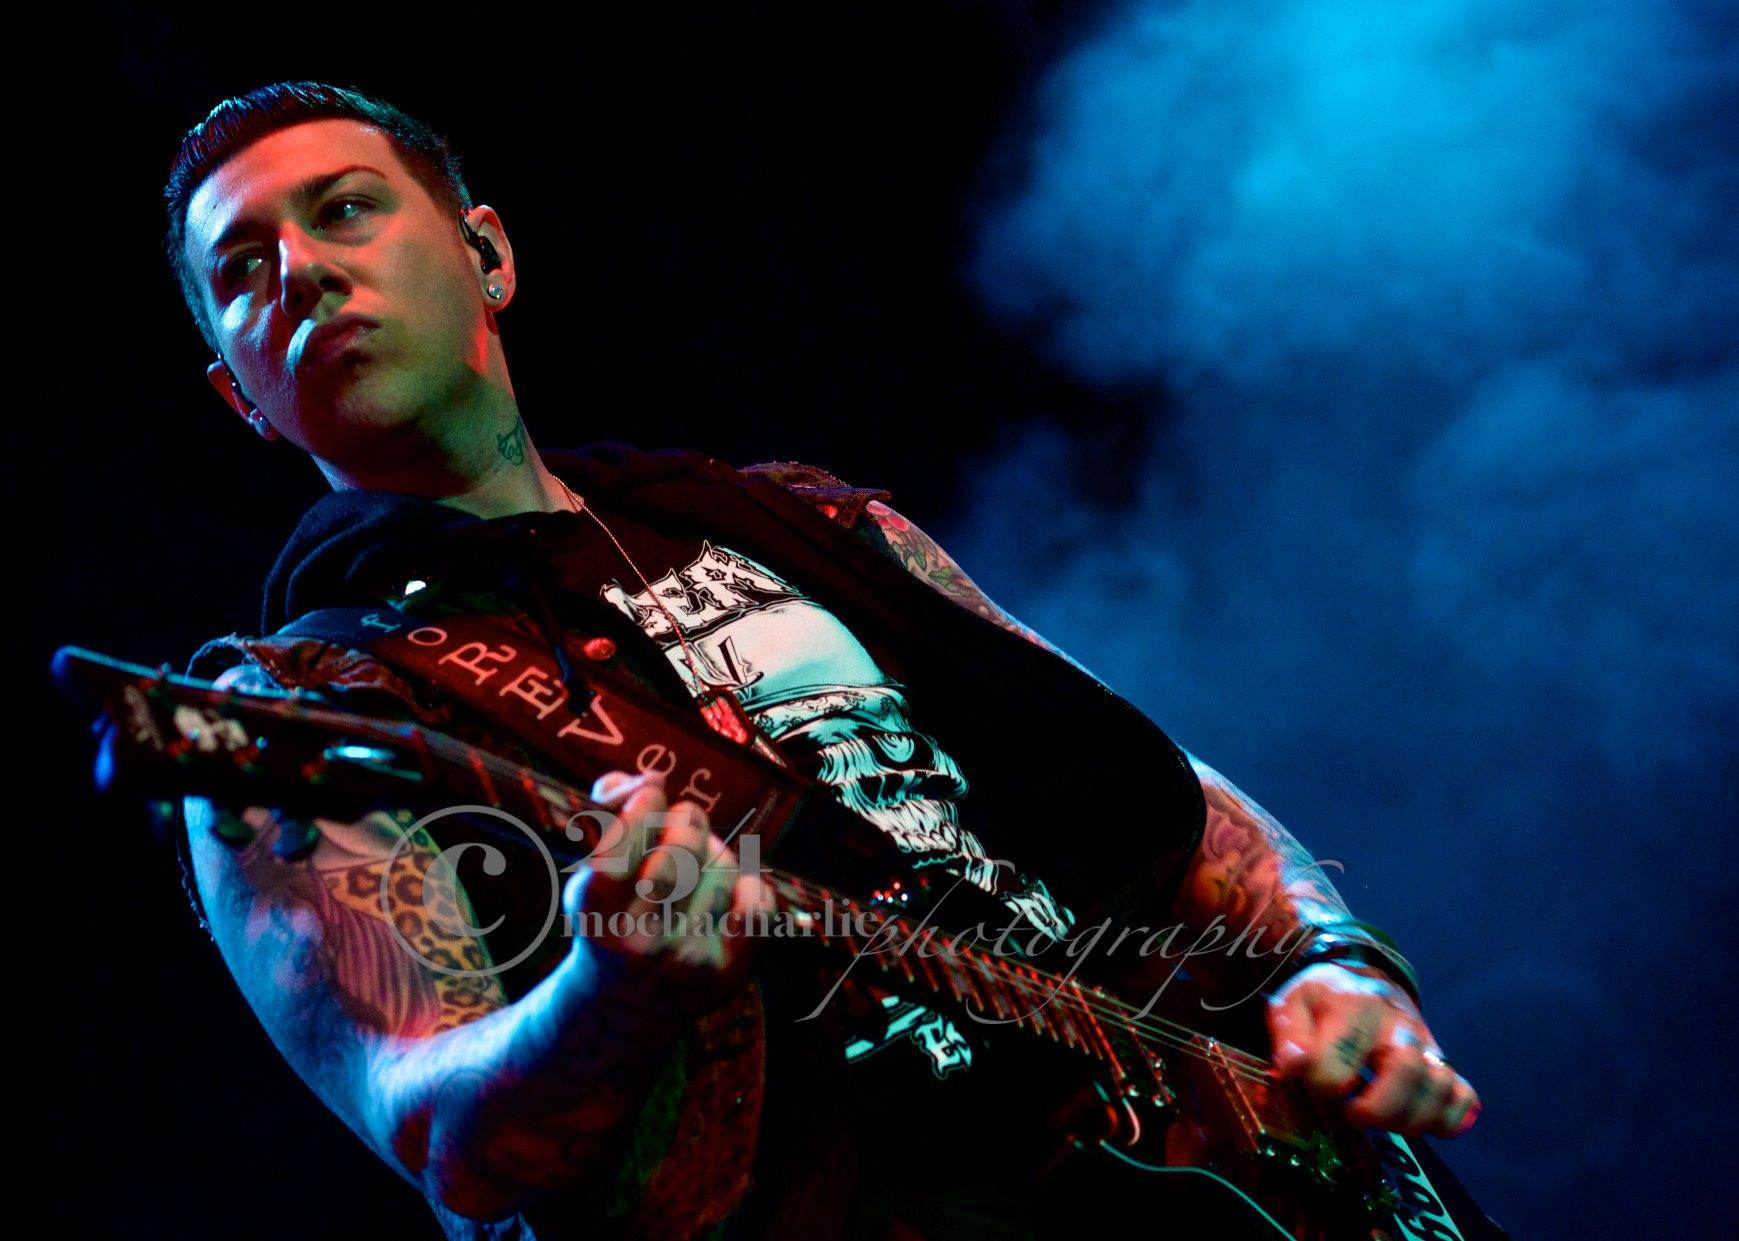 Avenged Sevenfold at Mayhem Festival (Photo by Mocha Charlie)